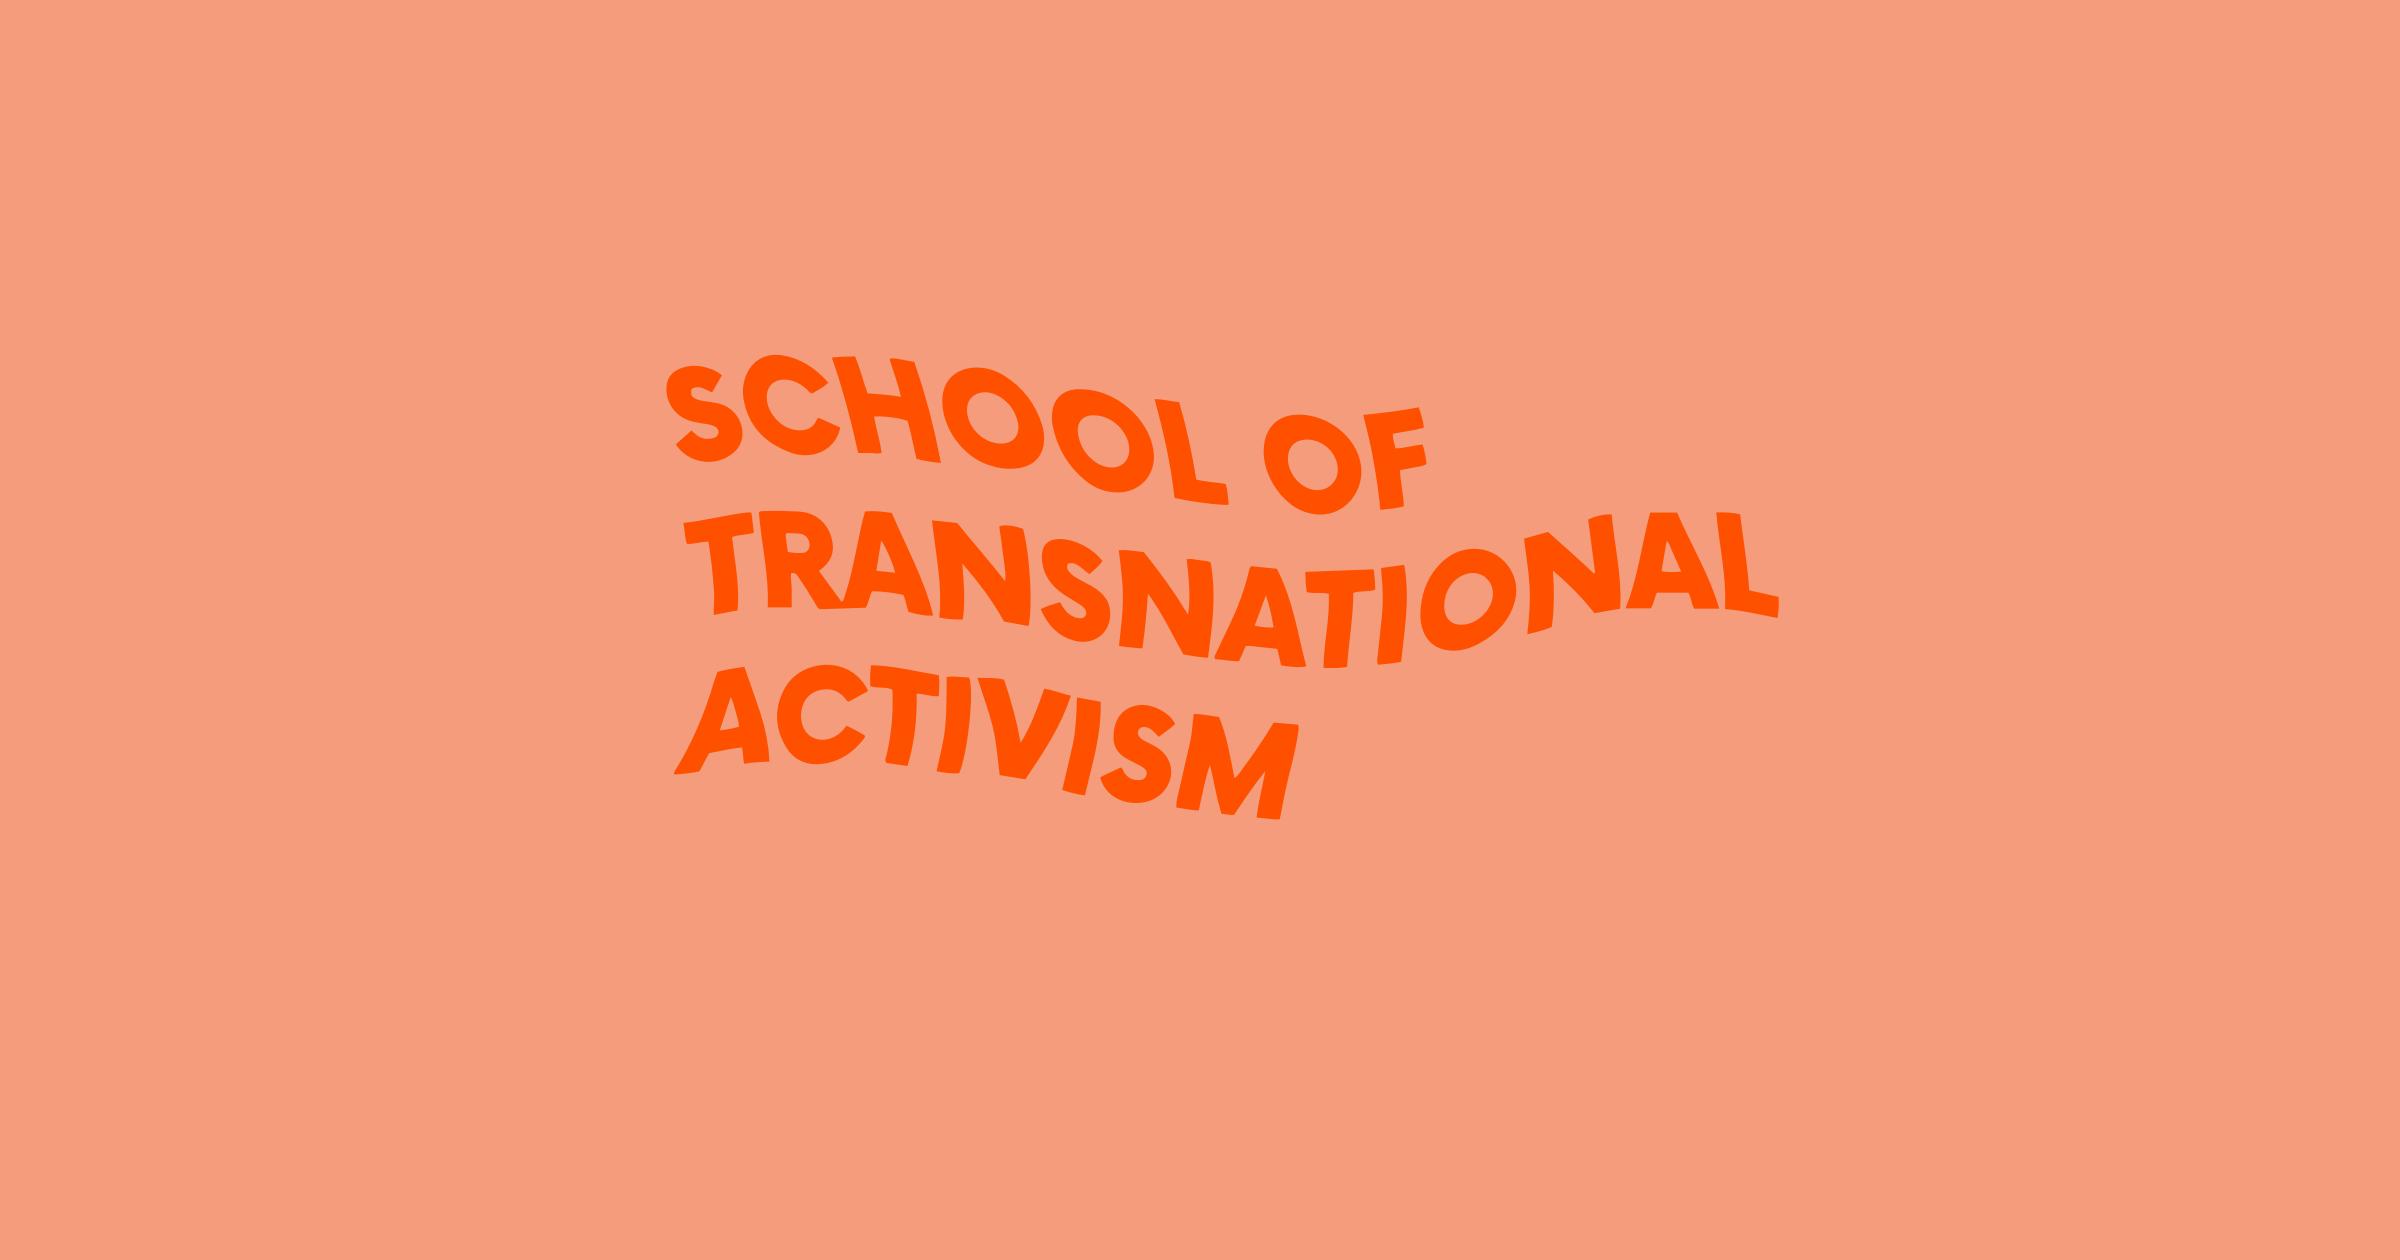 School of Transnational Activism